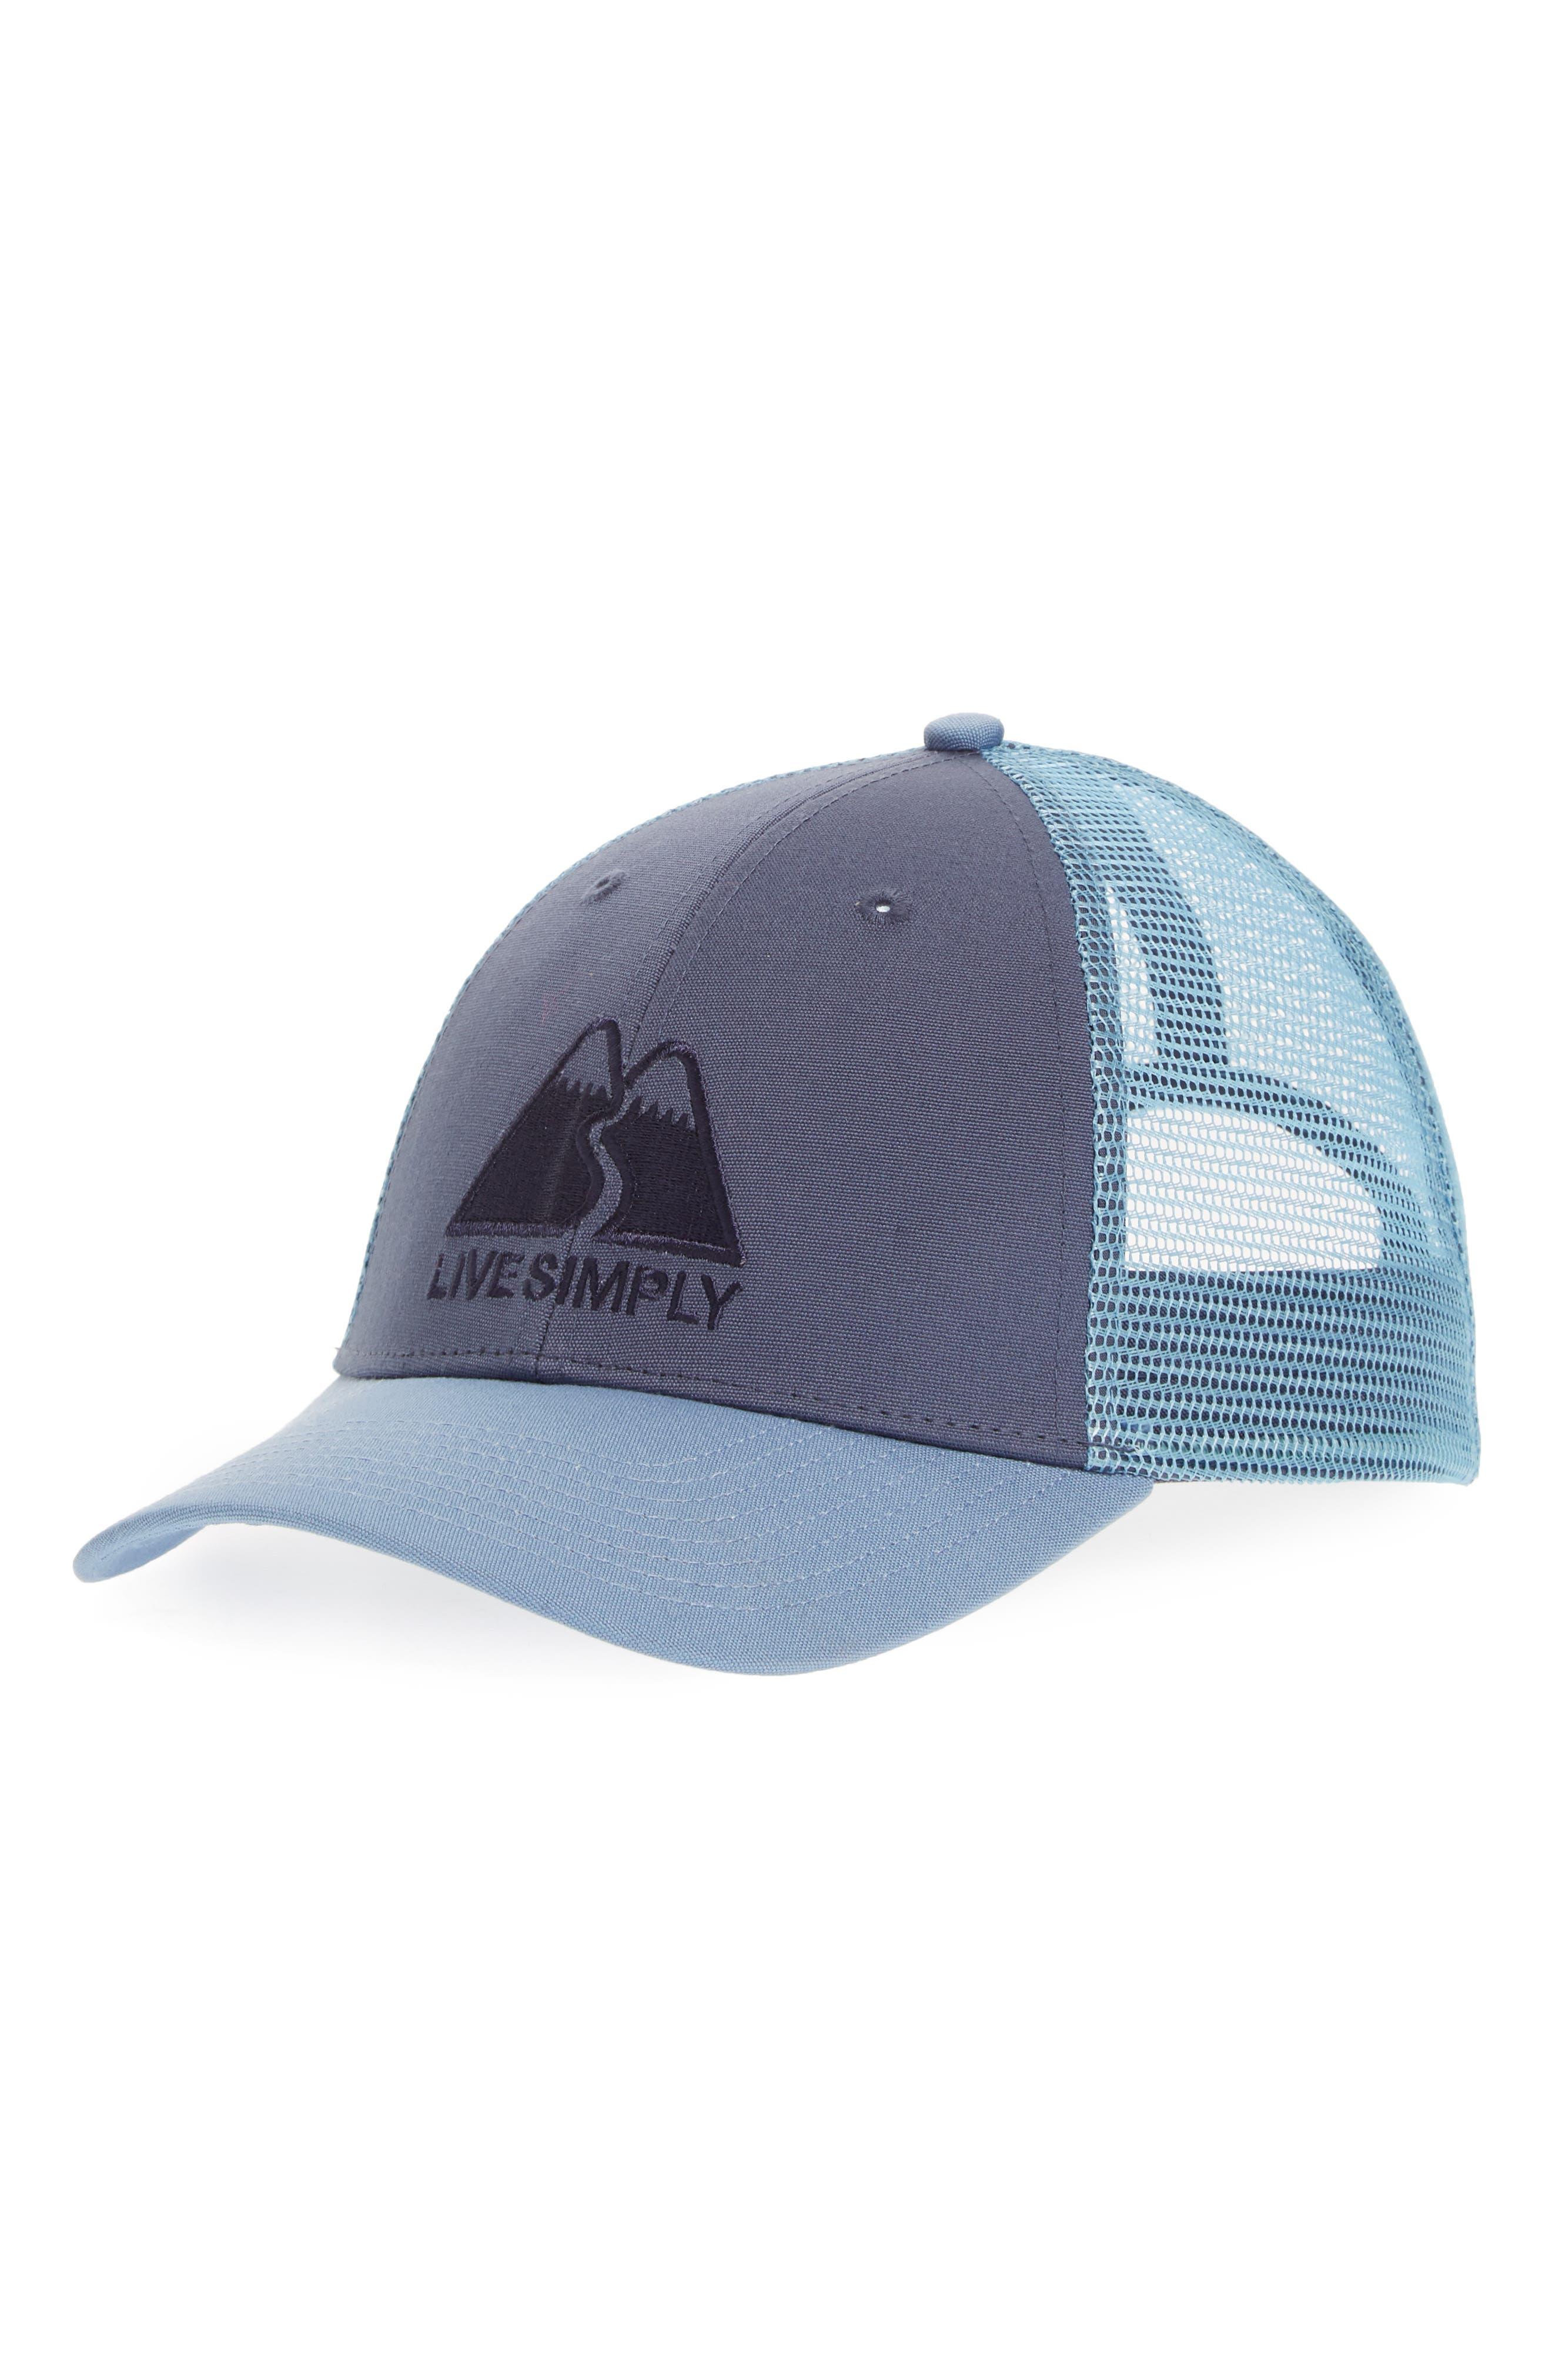 Live Simply Trucker Hat,                         Main,                         color, Dolomite Blue